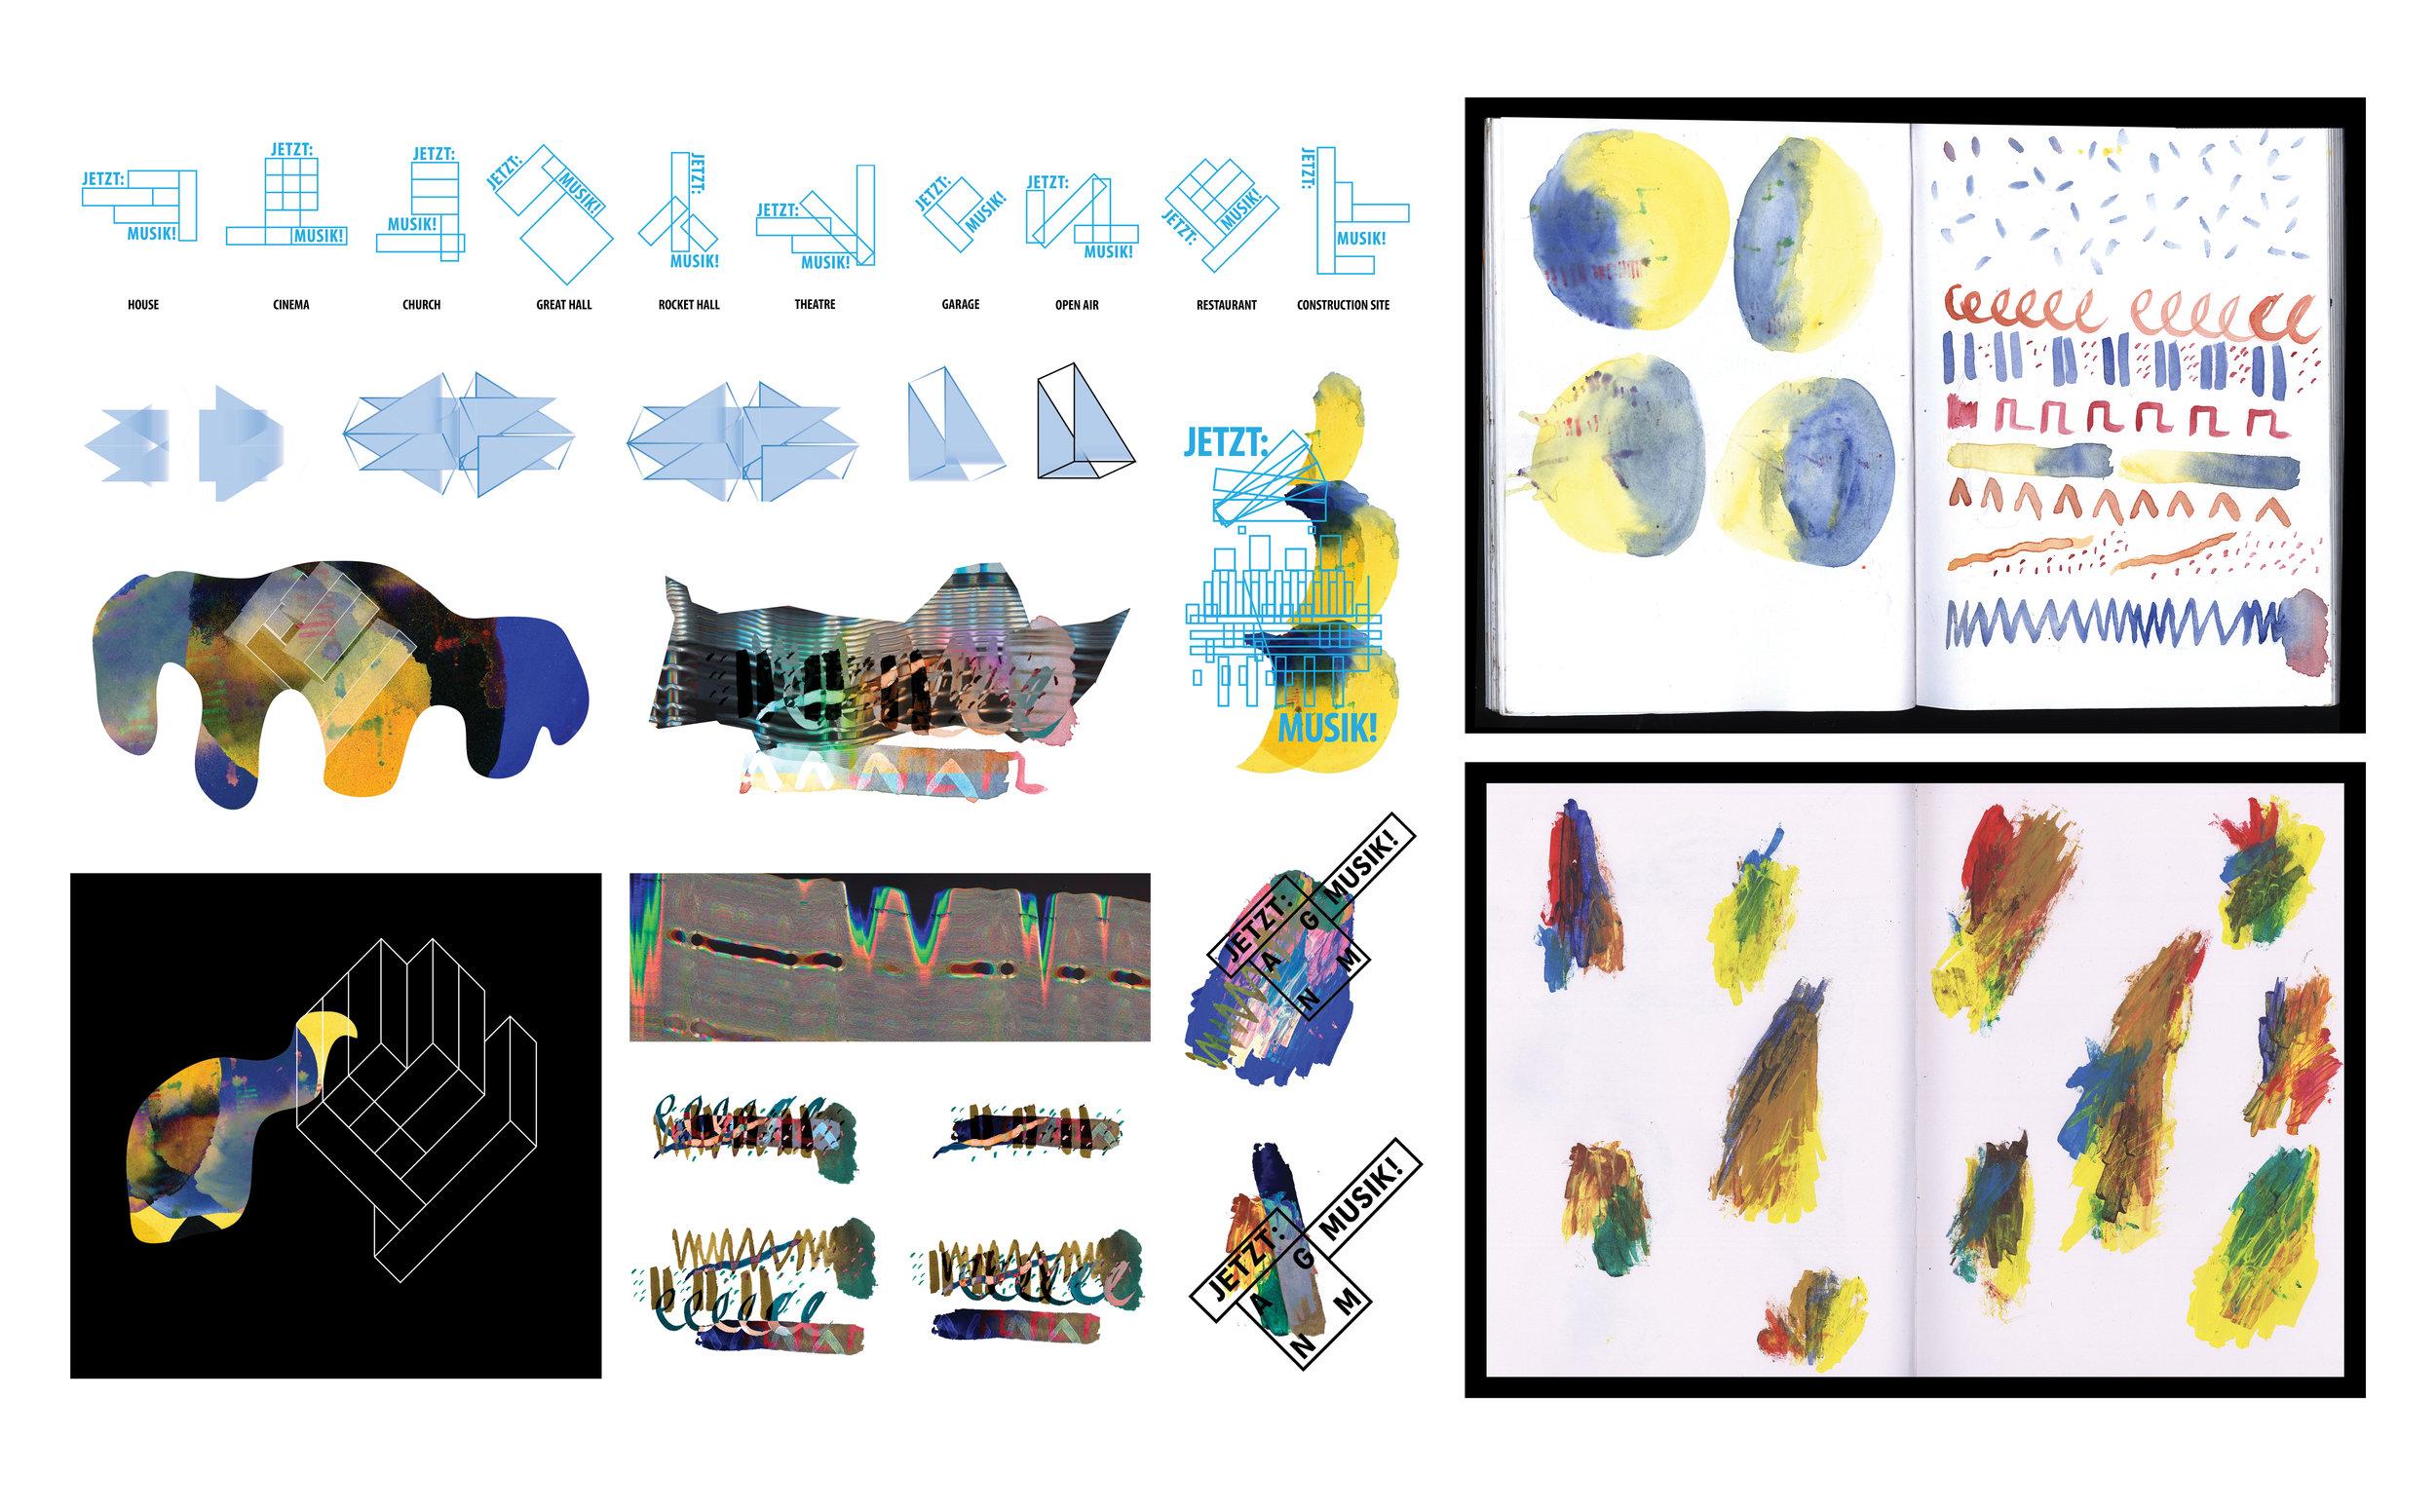 Jetzt Musik Concept Page.jpg